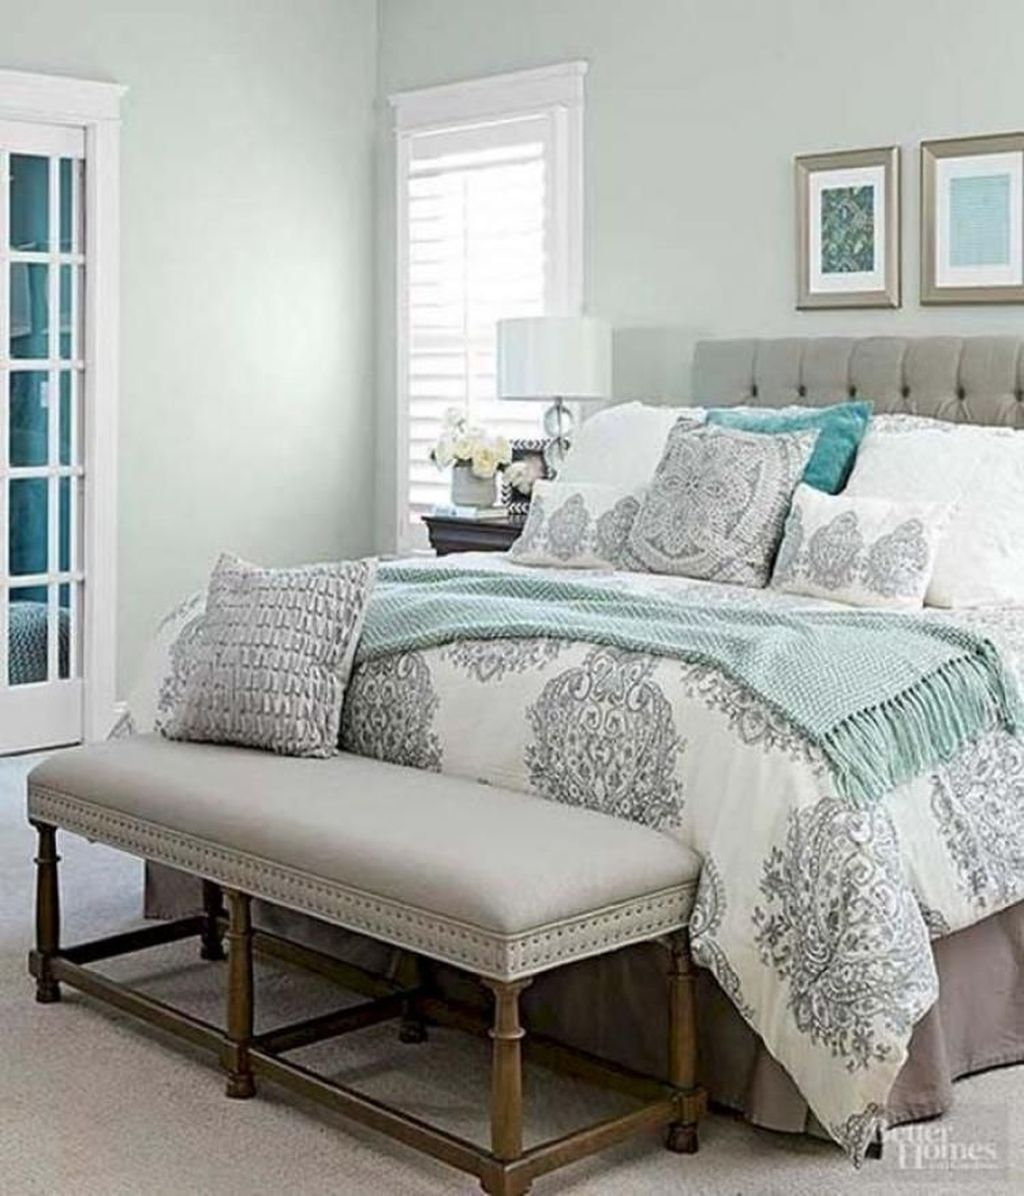 Cozy farmhouse master bedroom decoration ideas 18